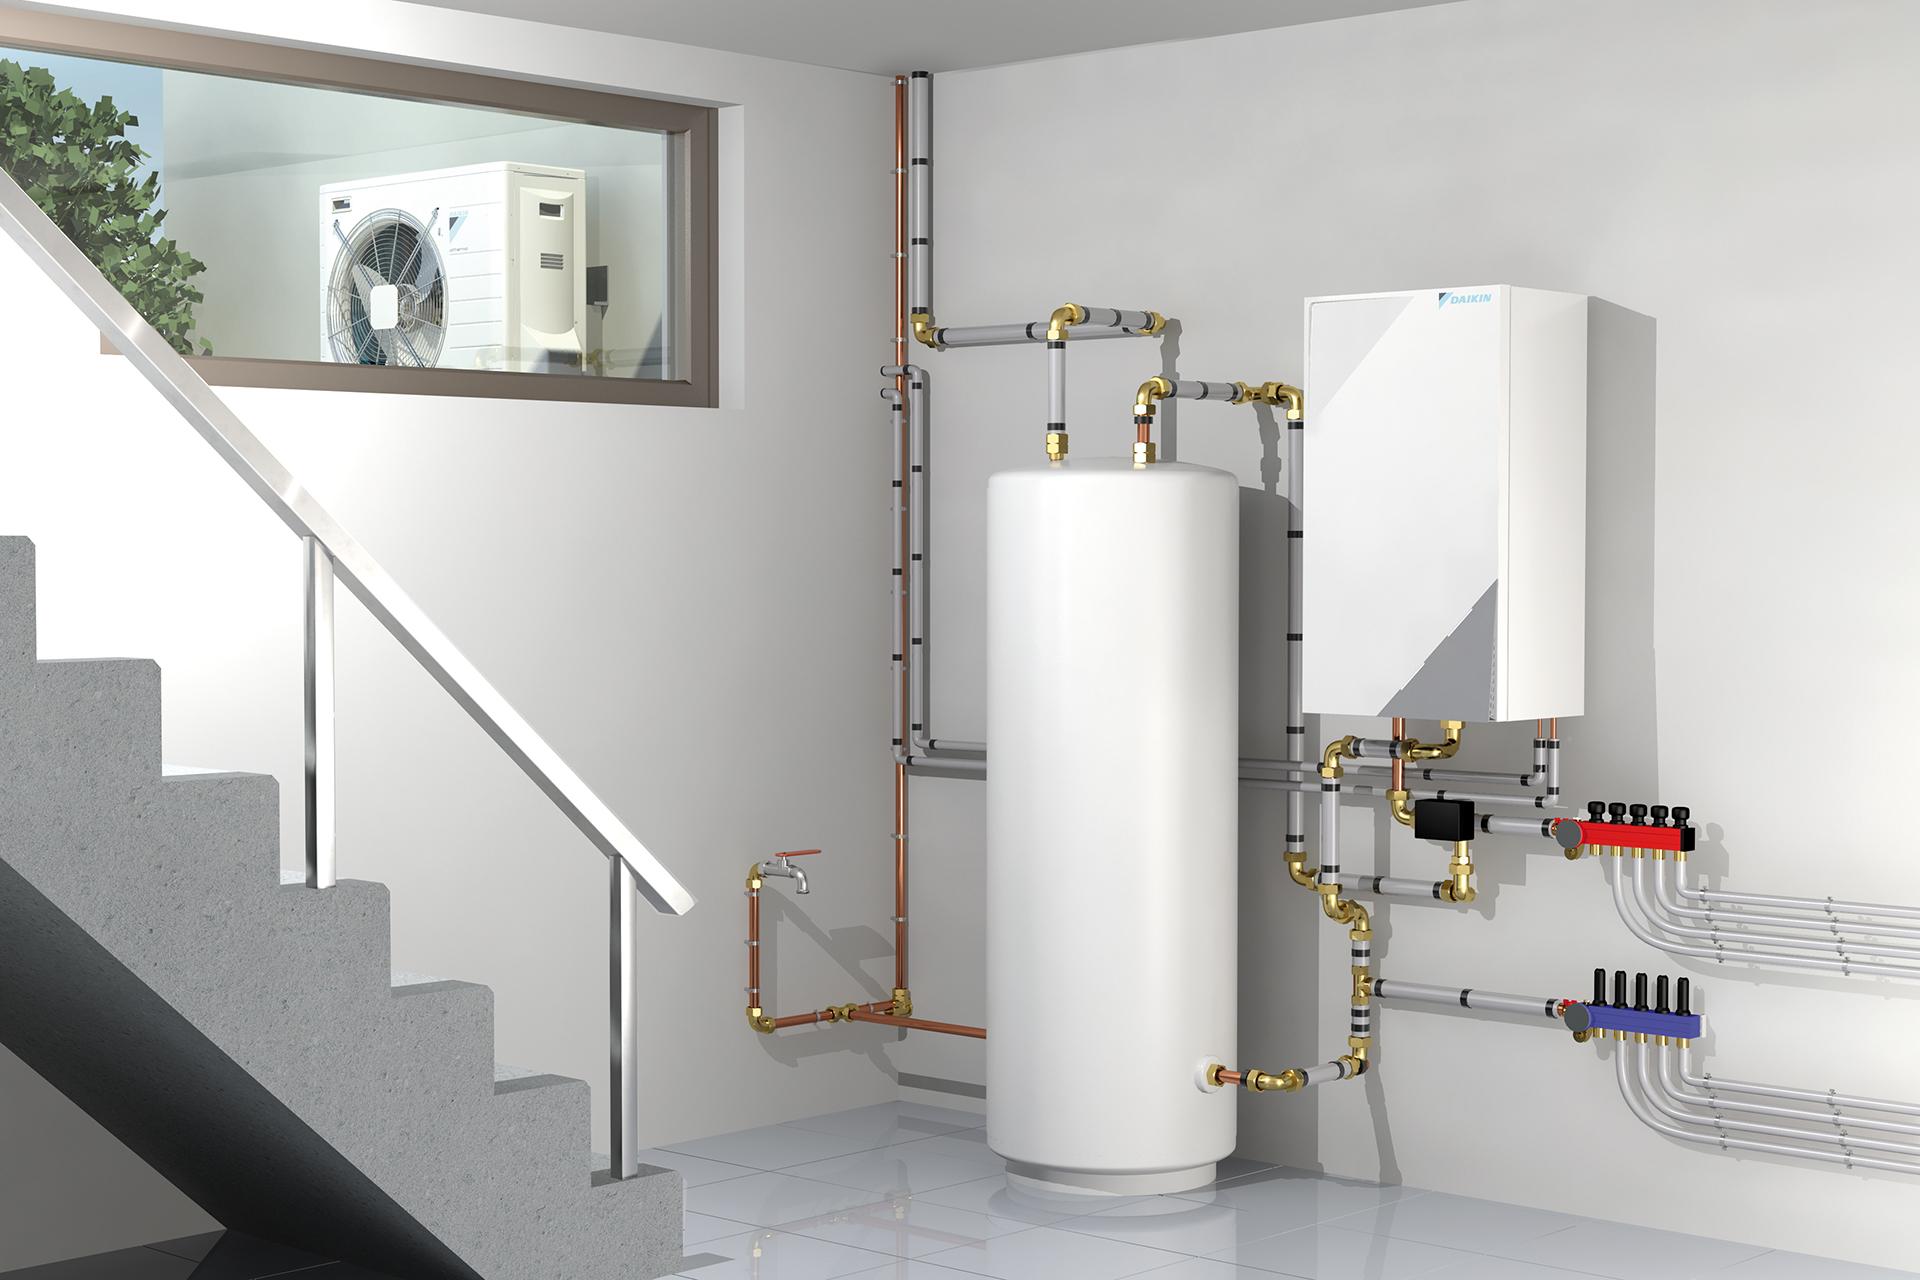 Wärmepumpen - Luft-Wasser-Wärmepumpe